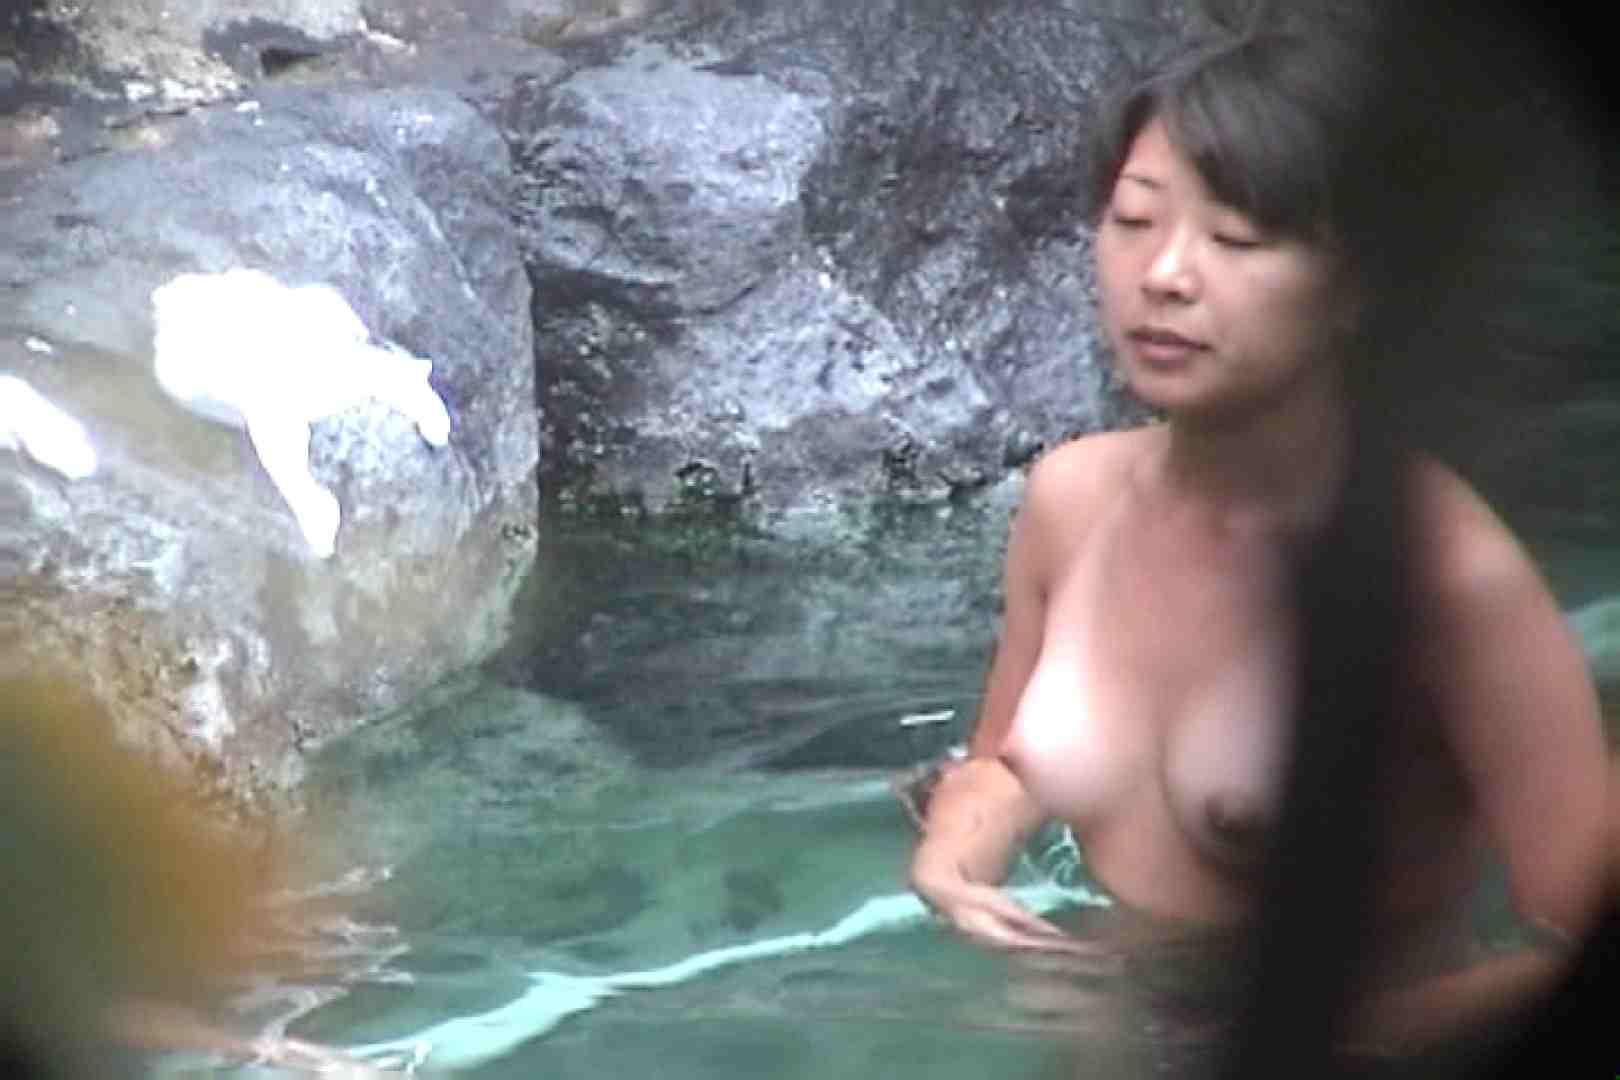 Aquaな露天風呂Vol.69【VIP限定】 OLのエロ生活   露天風呂  106連発 7